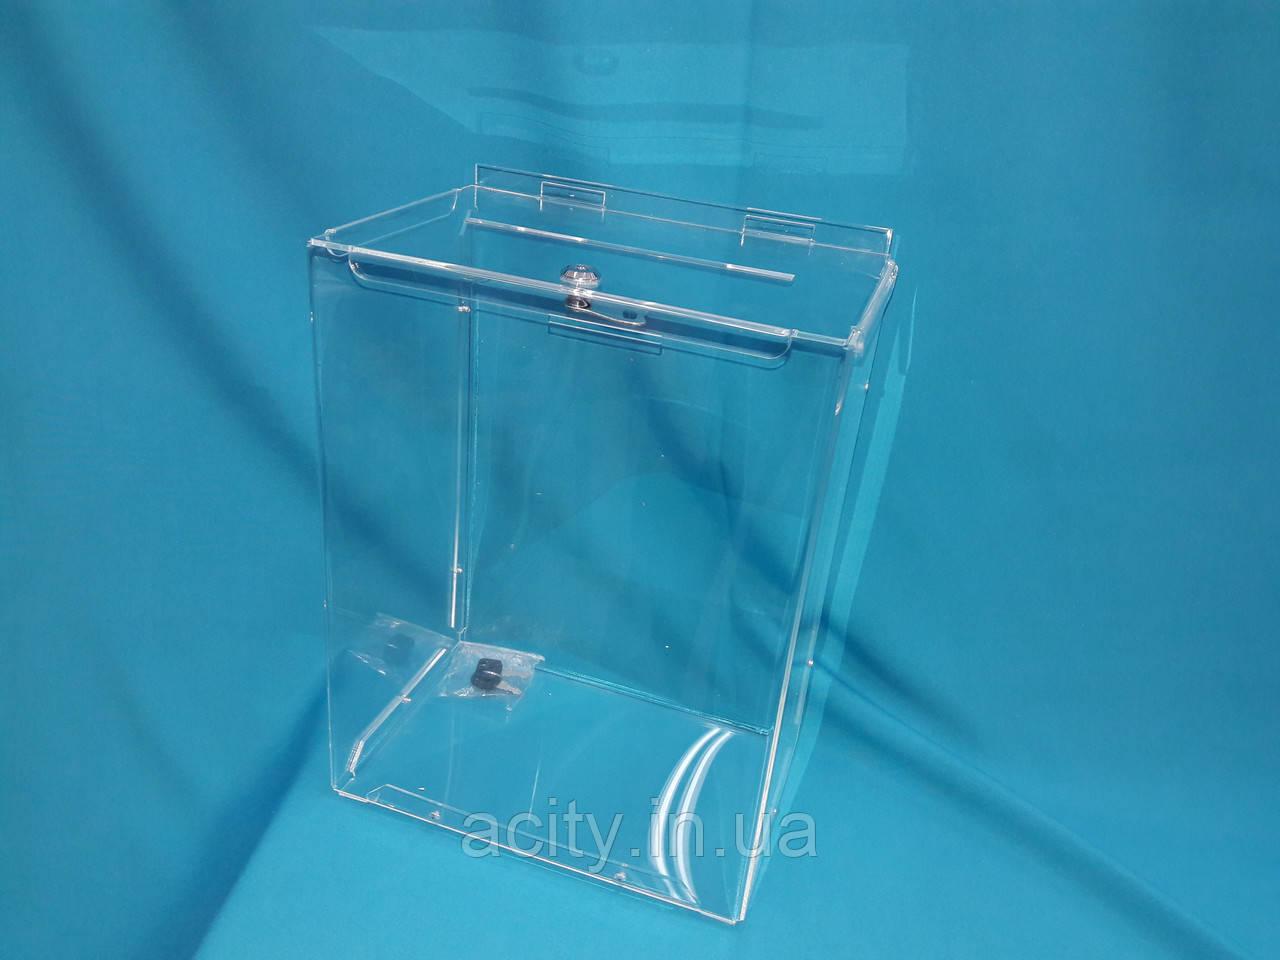 Коробка из оргстекла для пожертвований 2,5л 210_150_80 А5 формат - АкрилСити в Киеве